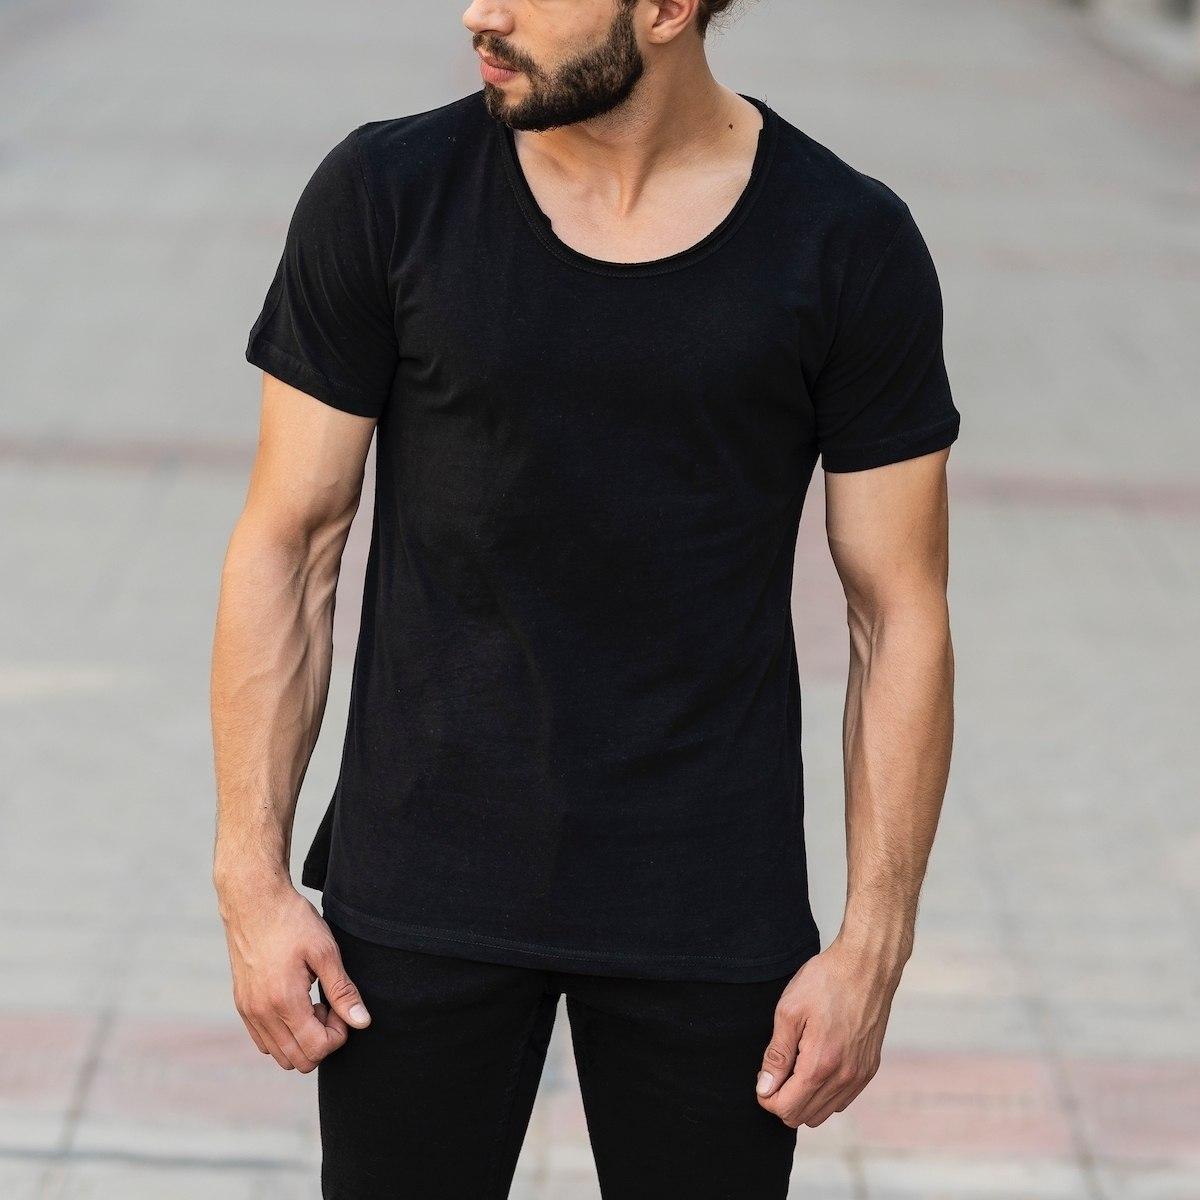 Croped Collar Black T-Shirt Mv Premium Brand - 1